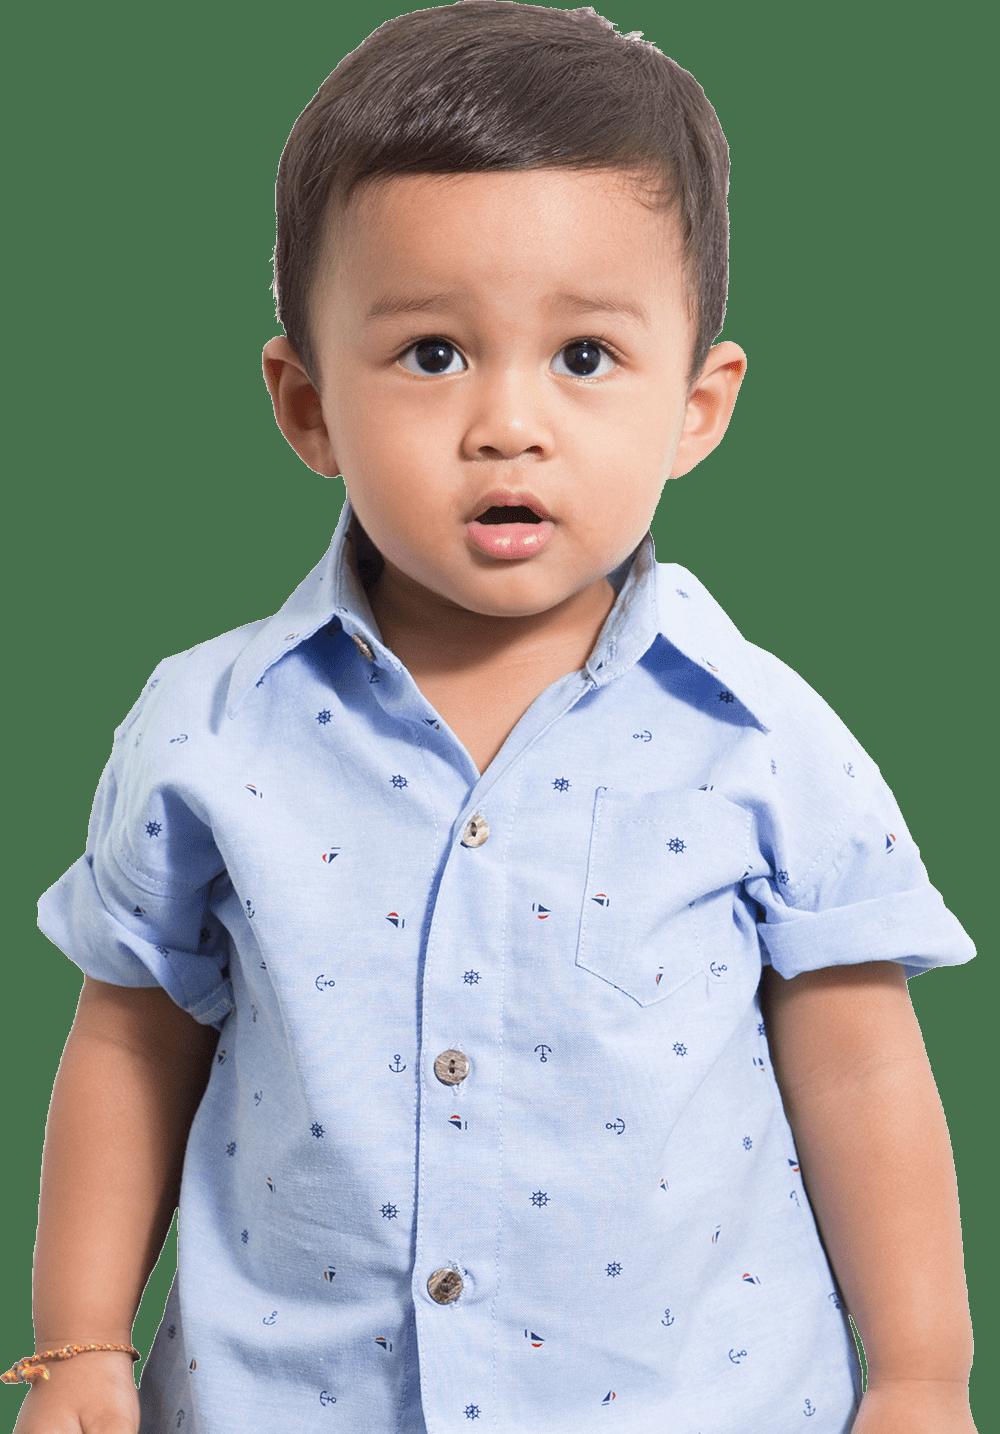 Toddler Preschool & Daycare Serving El Cajon, Lakeside And Santee CA